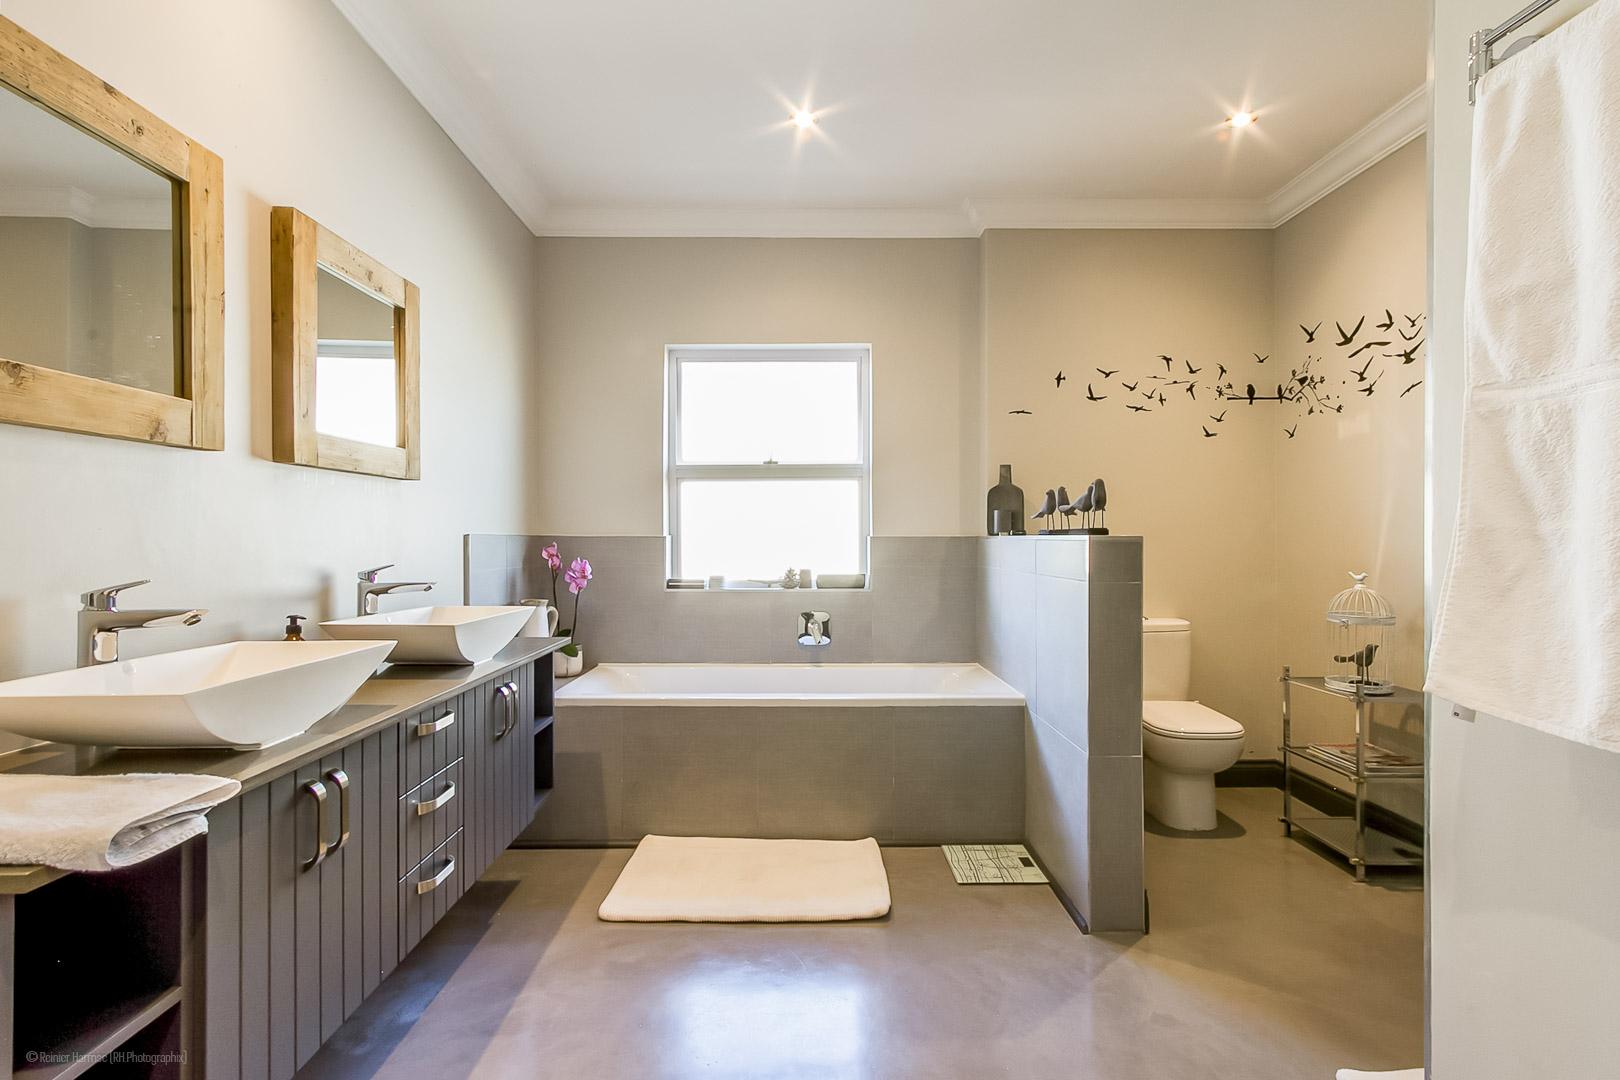 RHPX_Portfolio_The Waterfall Village Home interior-7